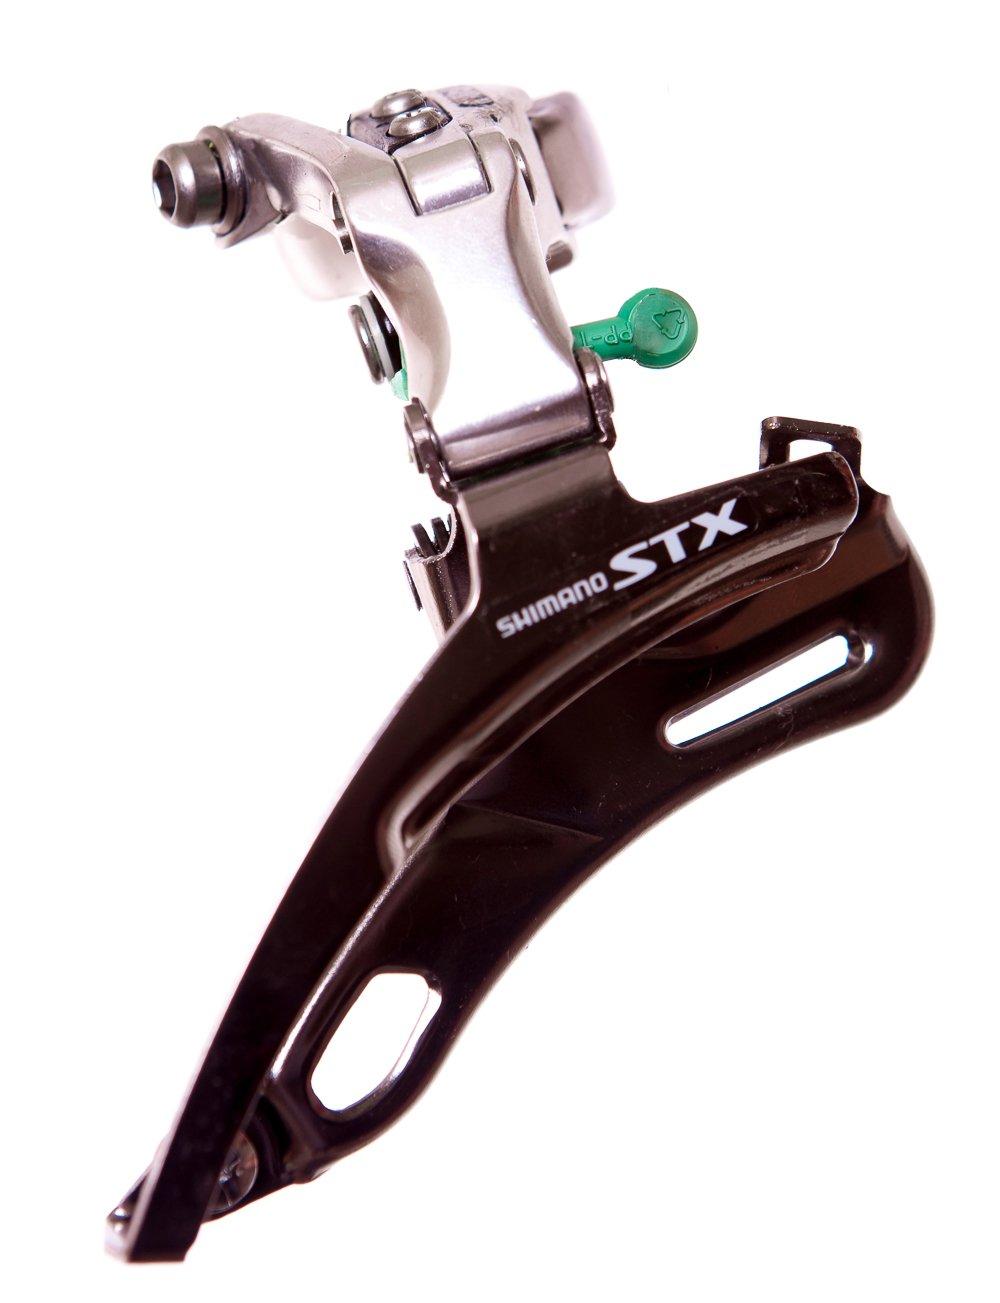 FD-MC31 Shimano STX Bottom Pull 31.8mm Bike FRONT GEAR MECH//DERAILLEUR